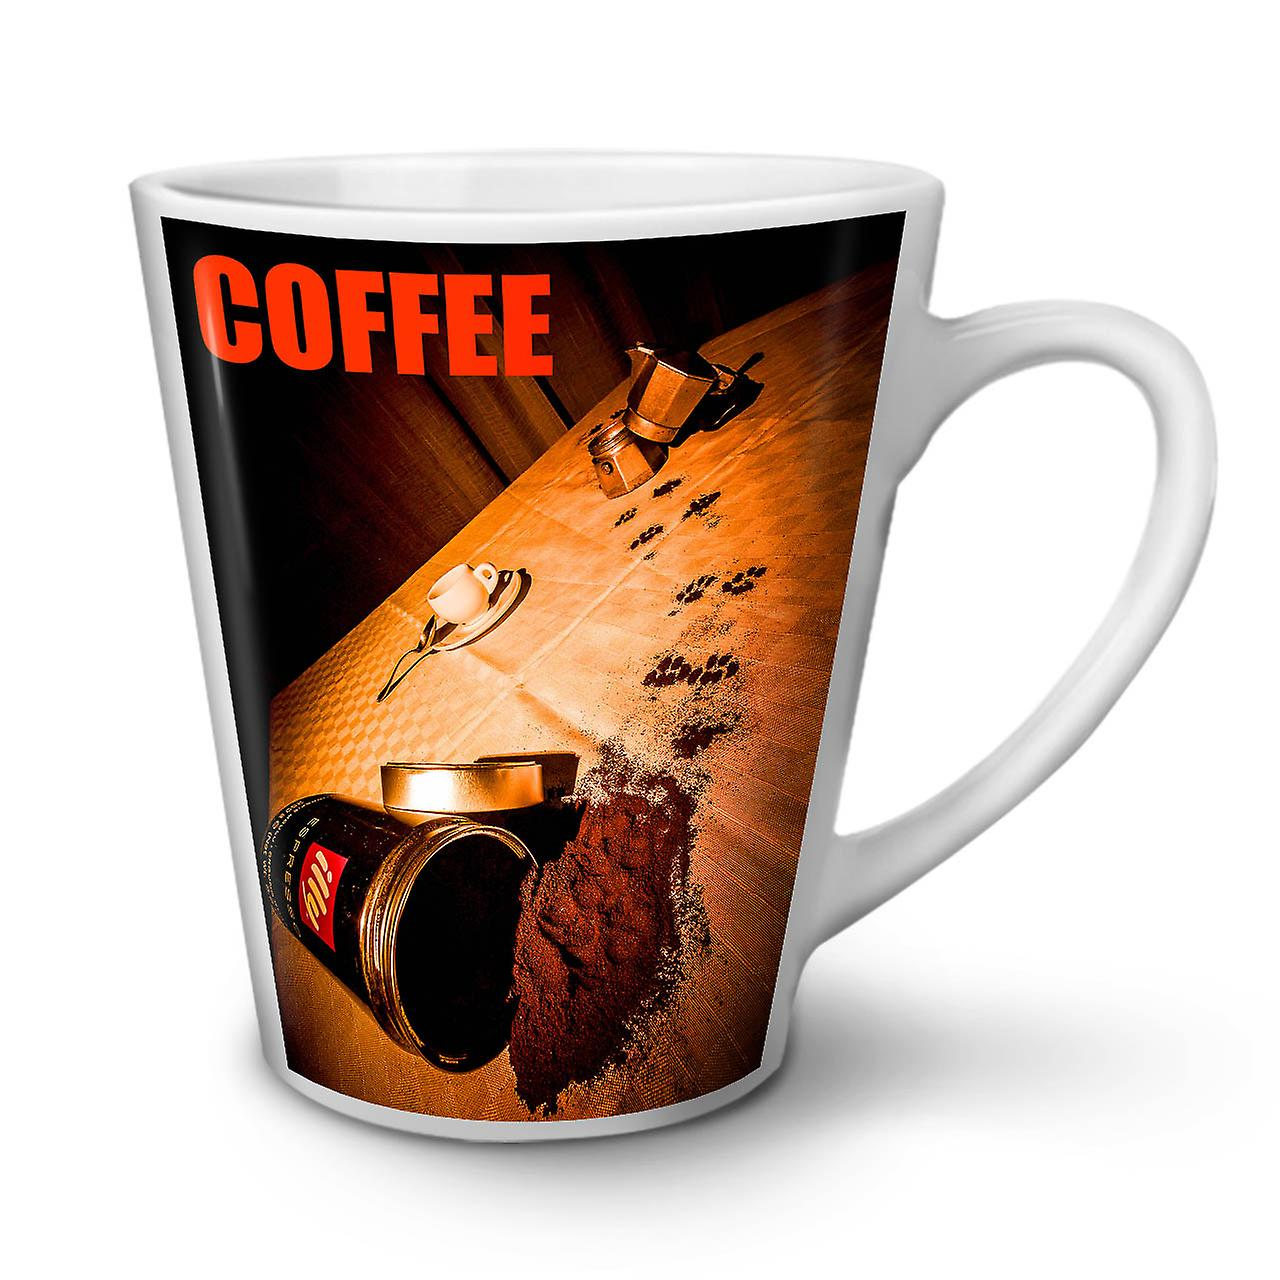 Tea Coffee Latte Mug New Hippie 12 White Berry OzWellcoda Ceramic rdCeBxWo